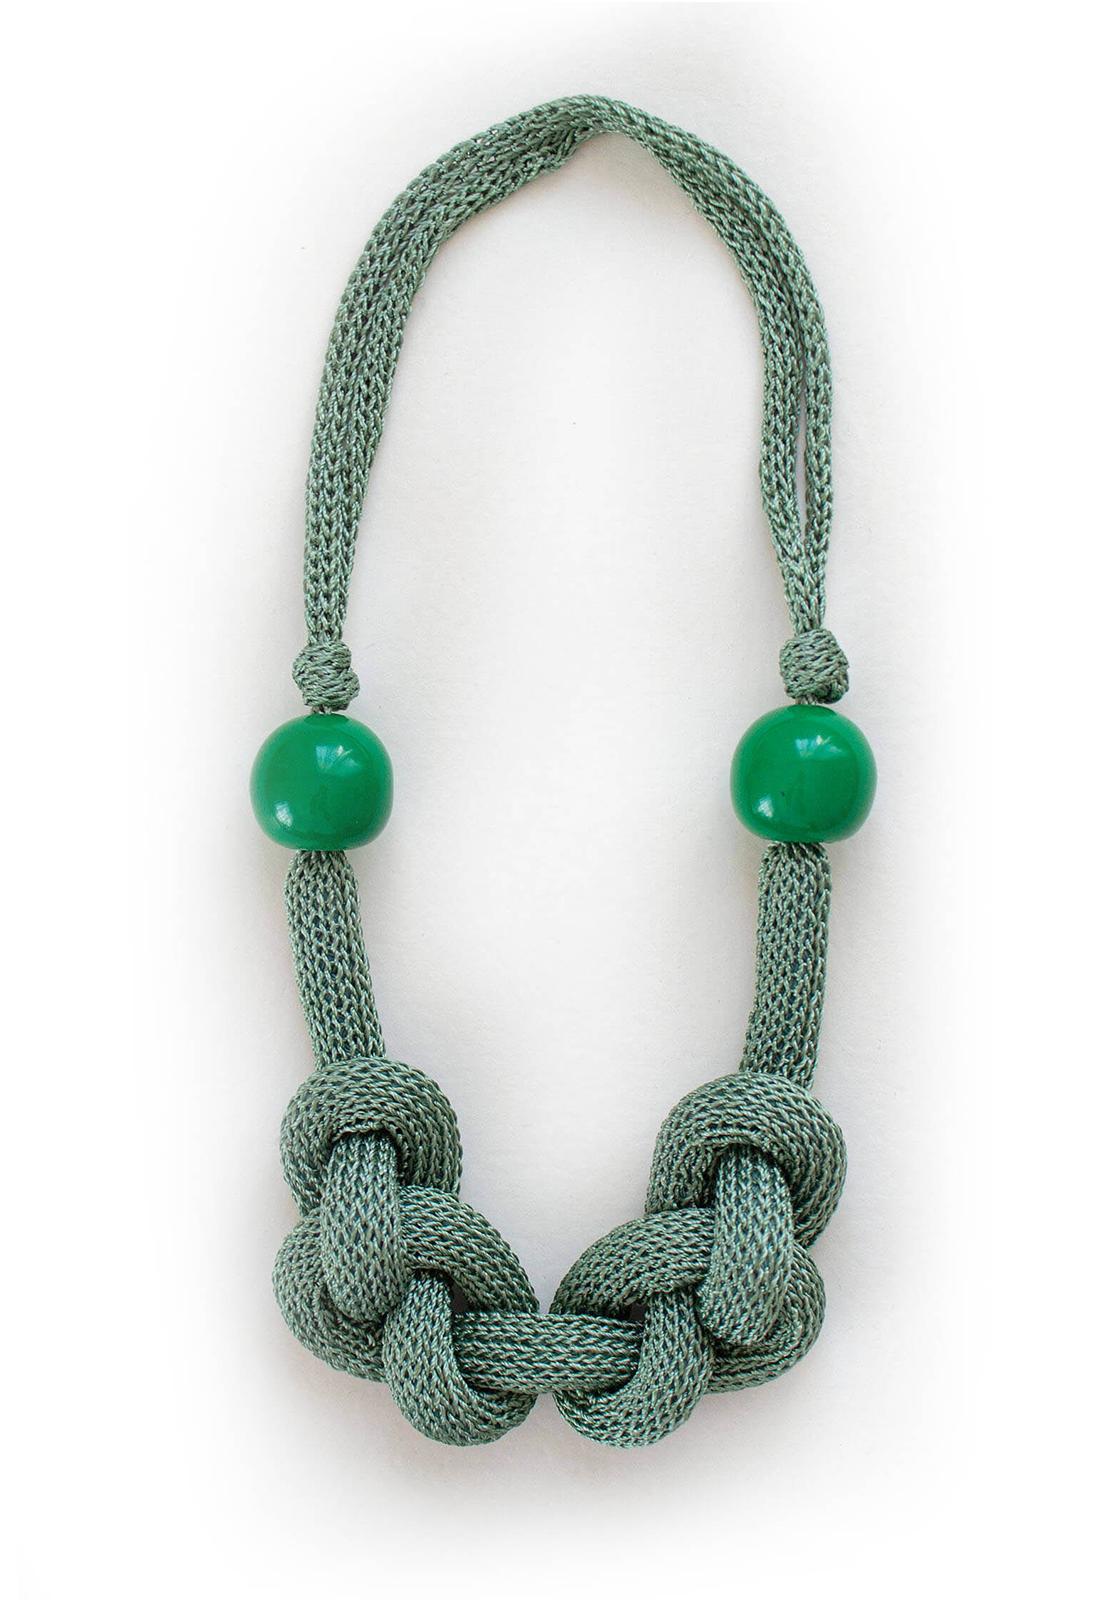 Collar Luisa Verde / Perlas Verdes